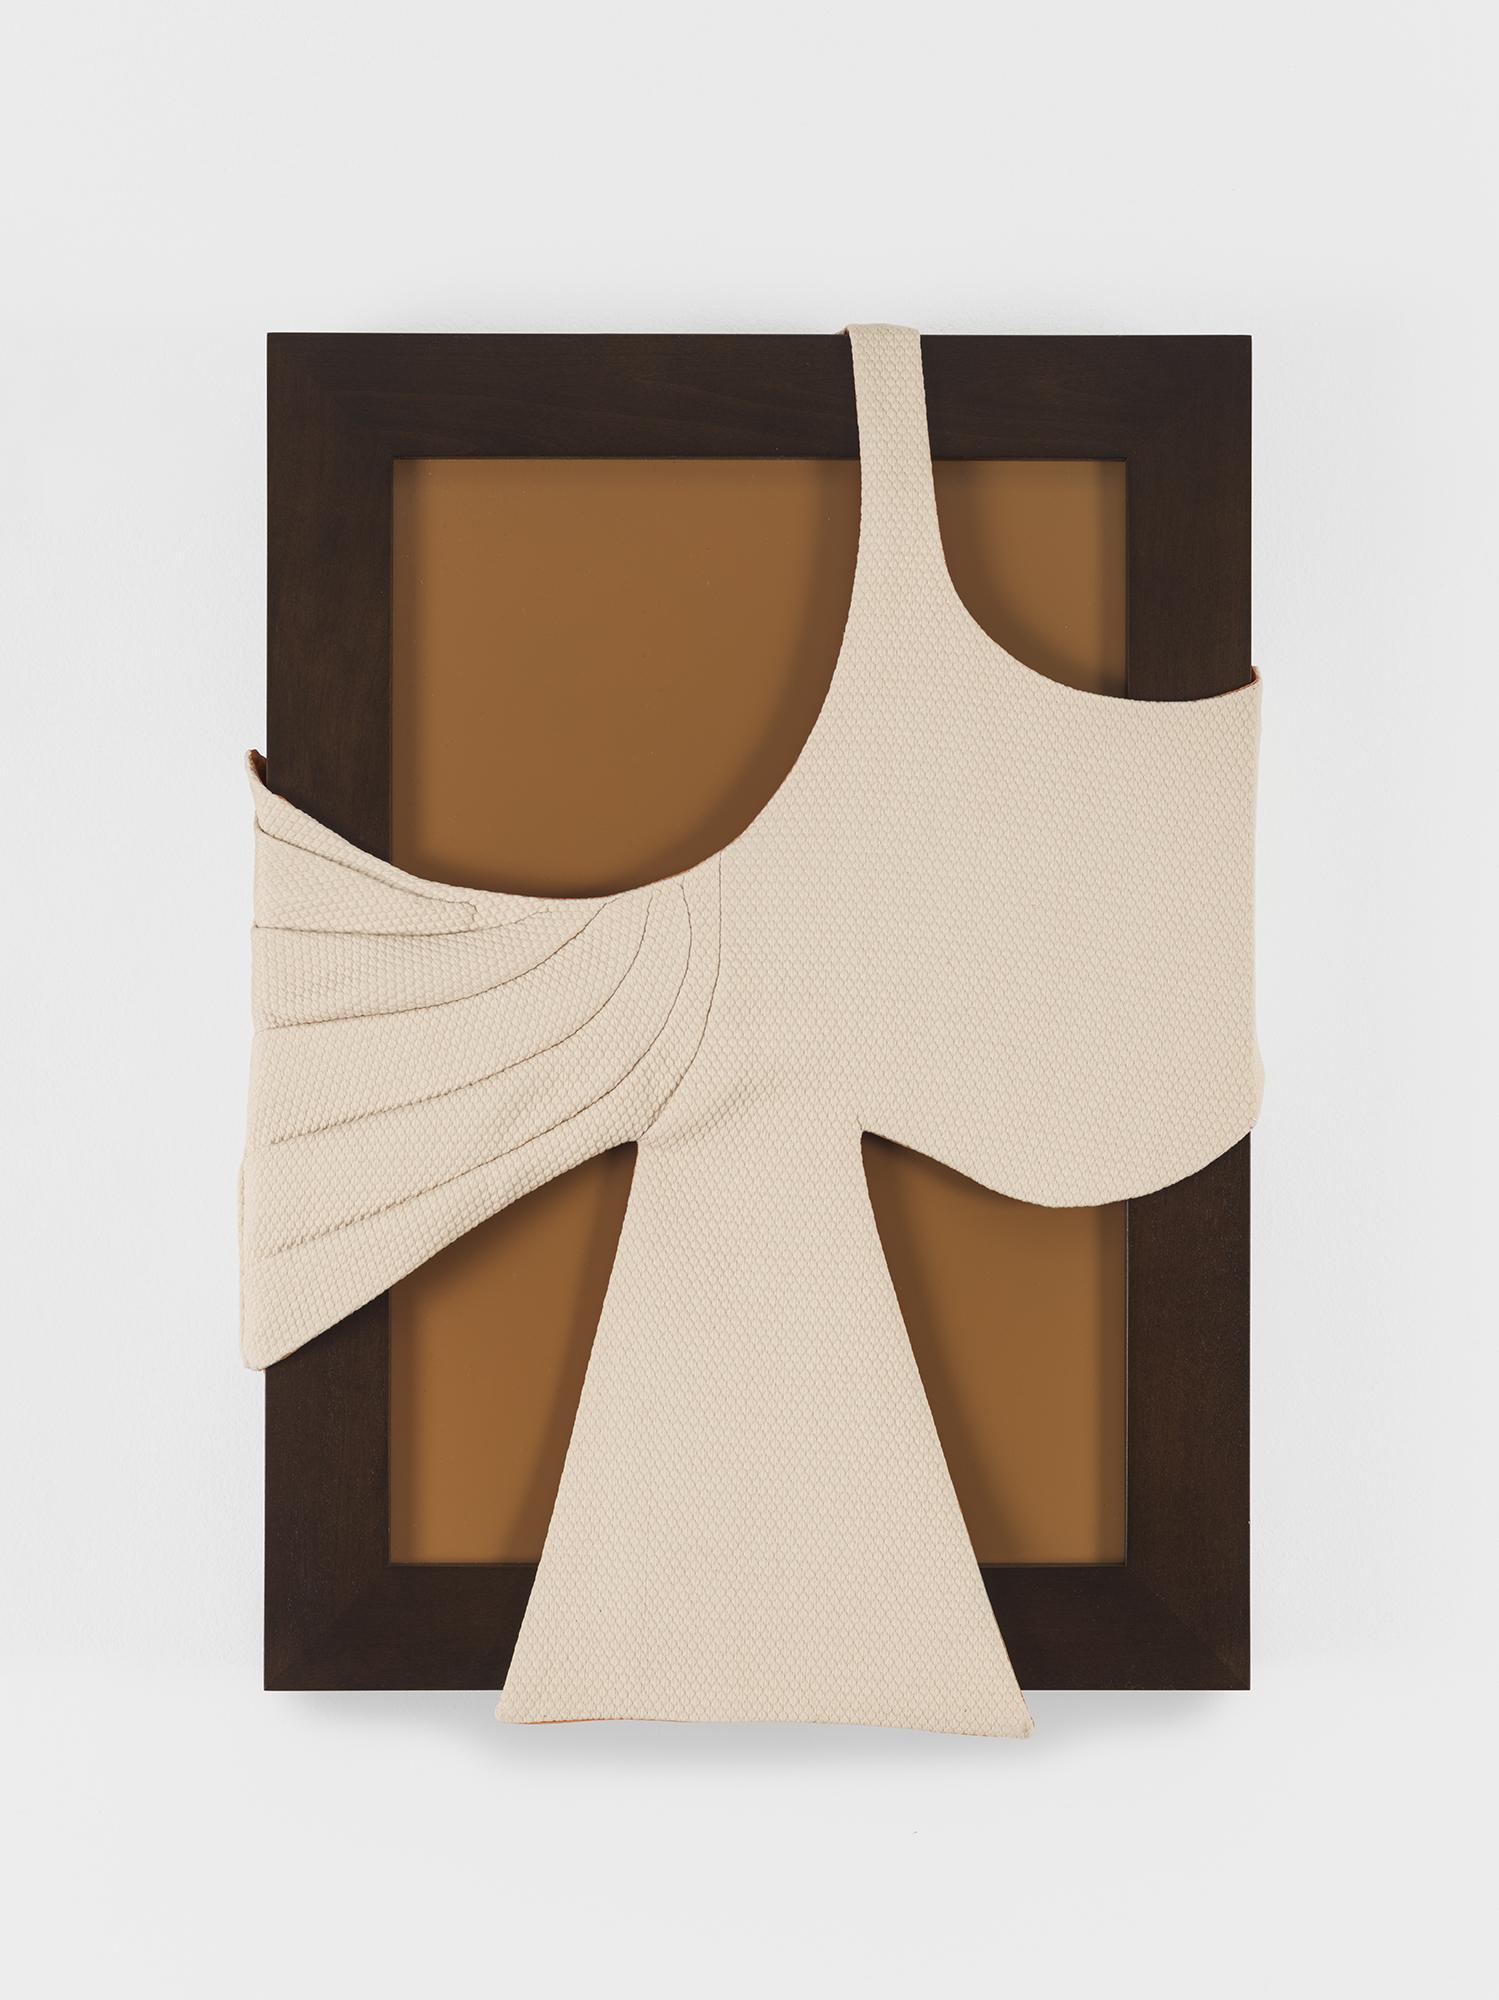 Laura Lima Aracy 2019 Fabric, thread, wood 21 1/2...